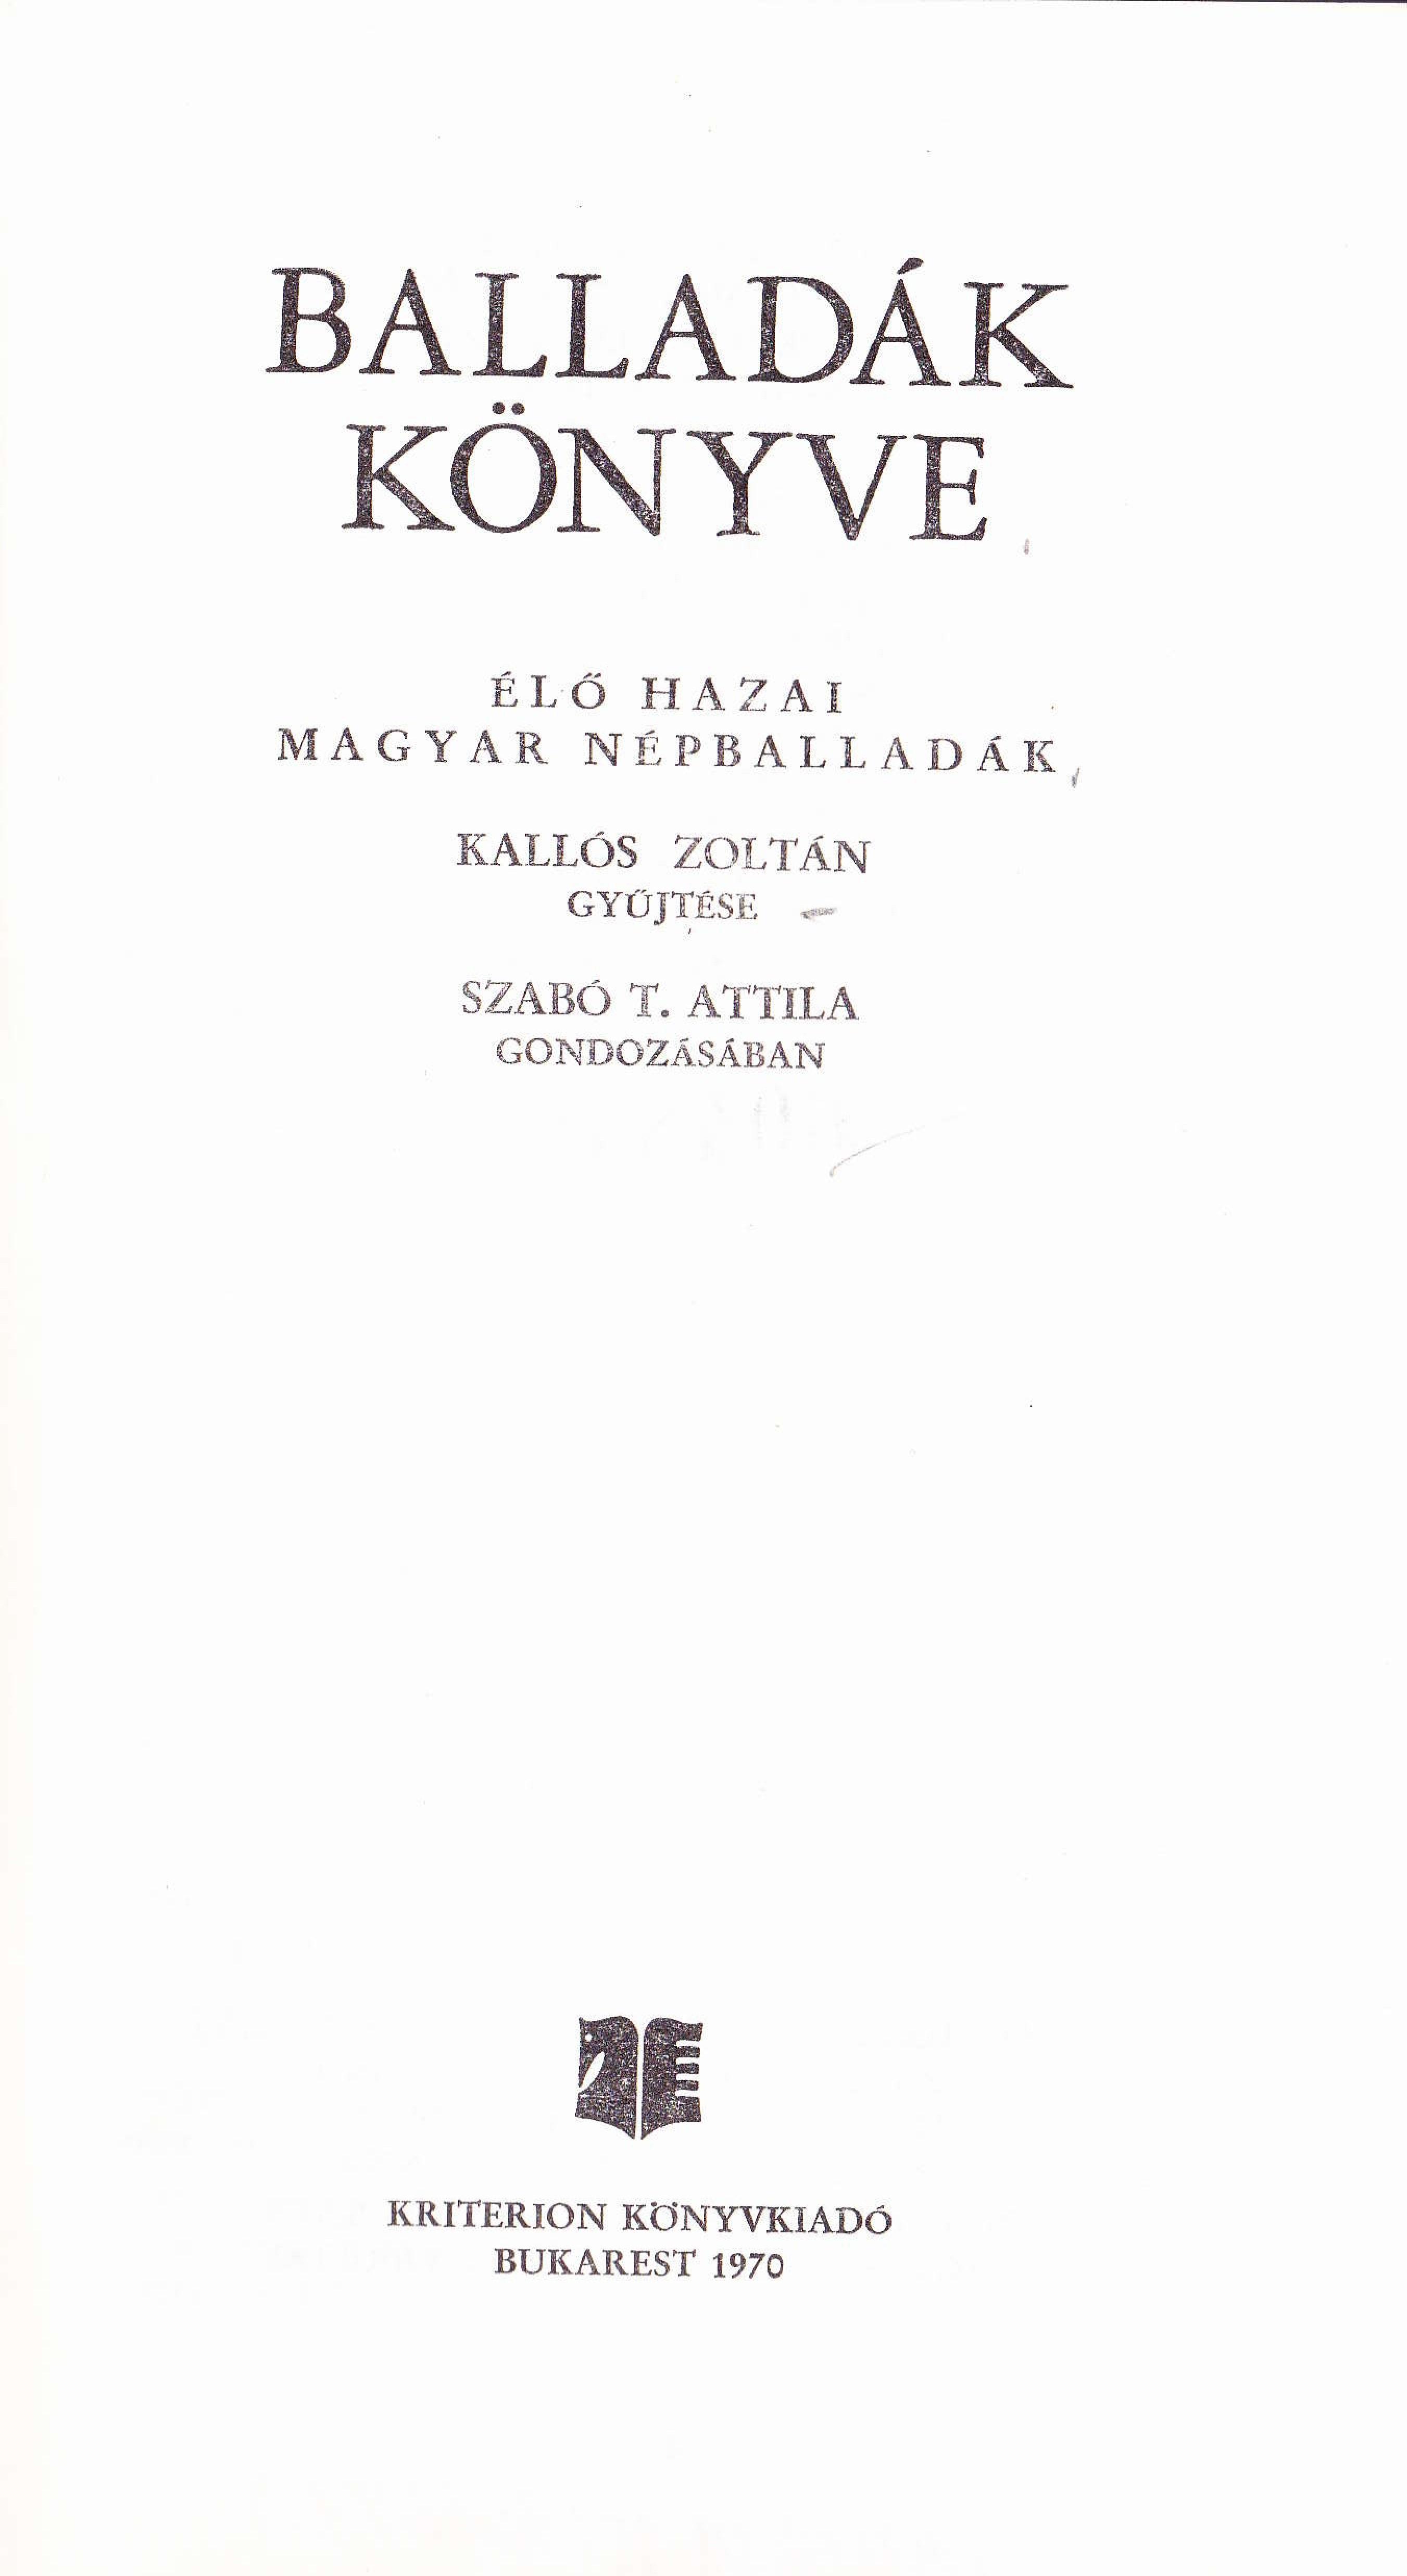 The title page of the book: Kallós, Zoltán and Attila Szabó T. 1970. Balladák könyve: Élő hazai magyar népballadák (Book of Ballads: Living Hungarian Folk Ballads from Romania). Bucharest: Kriterion